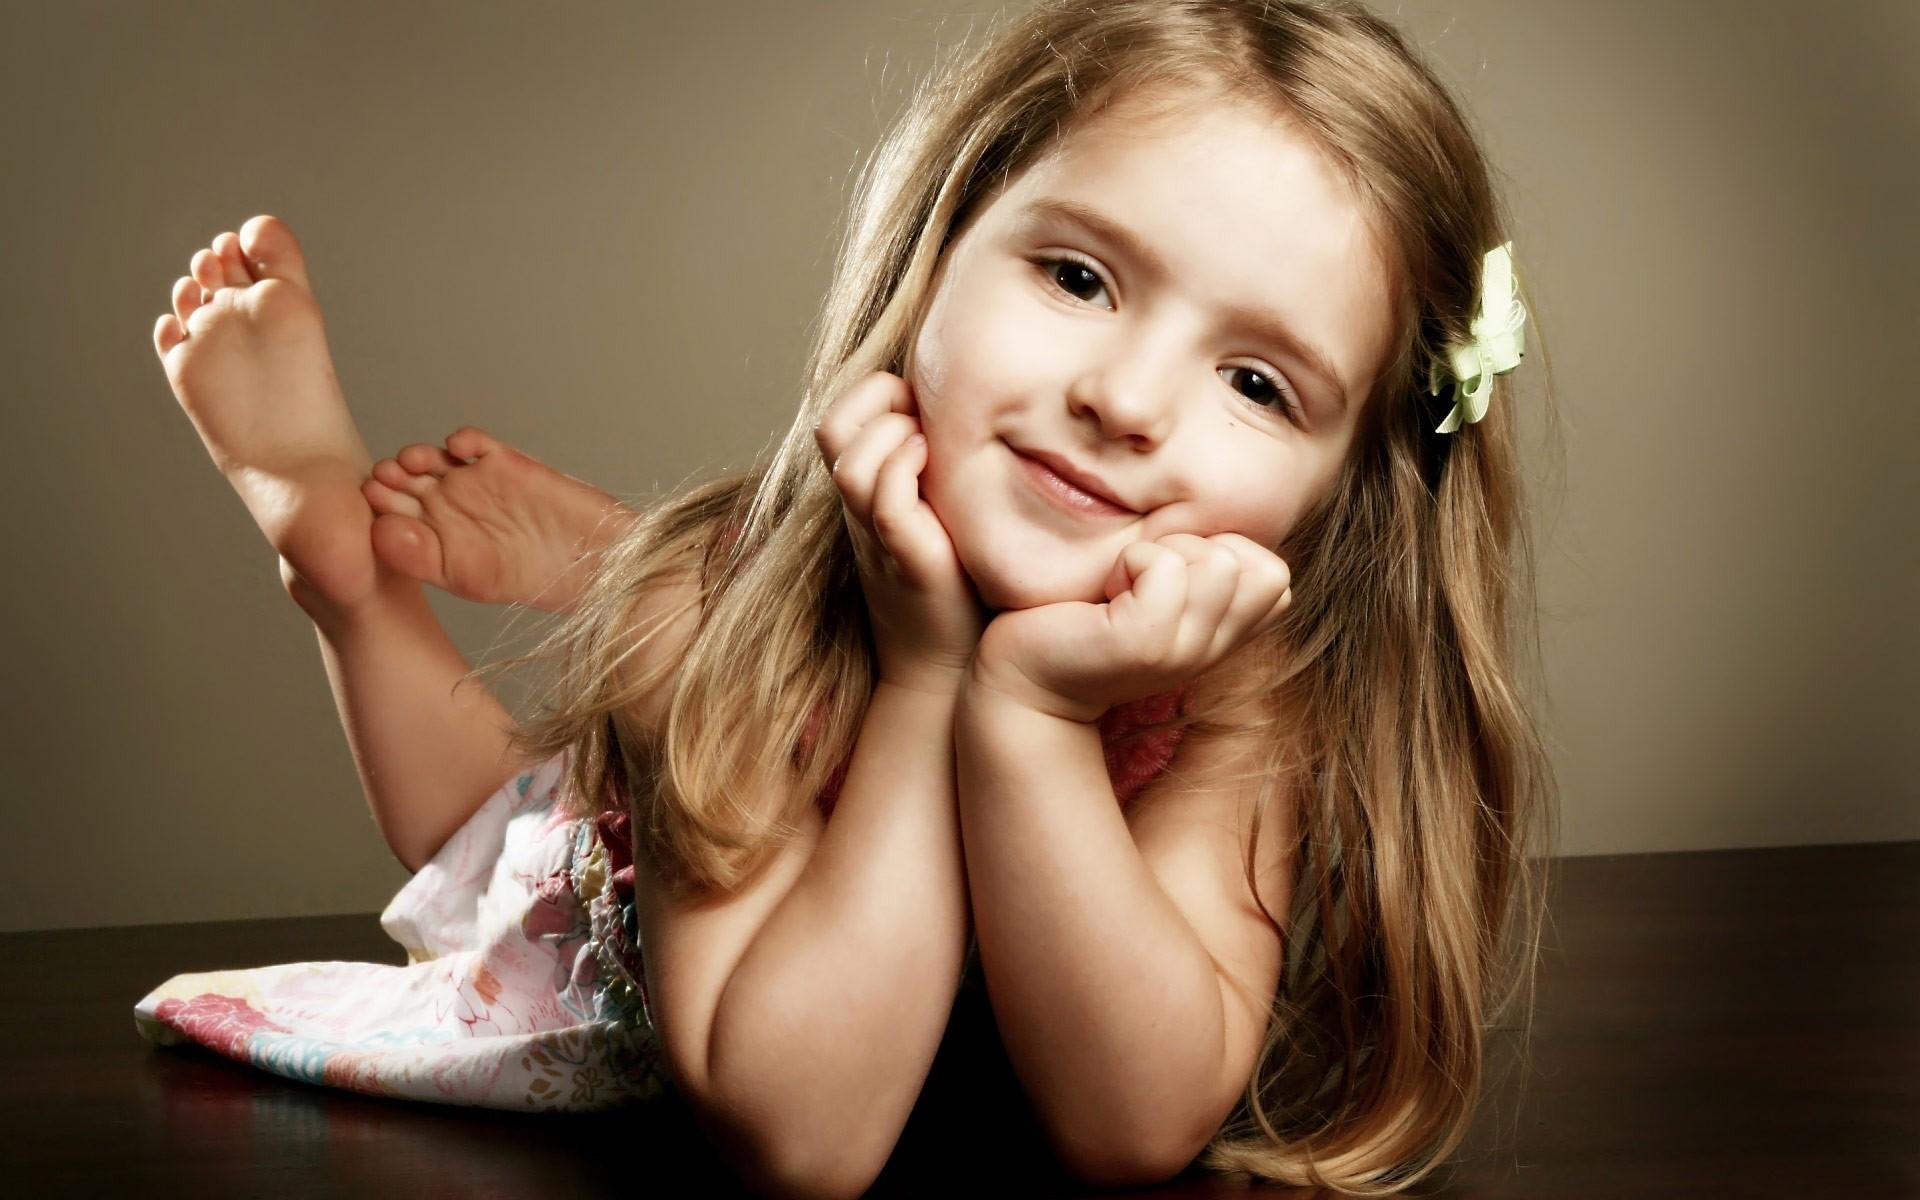 Pretty Cute Baby Girl Nice Wallpapers